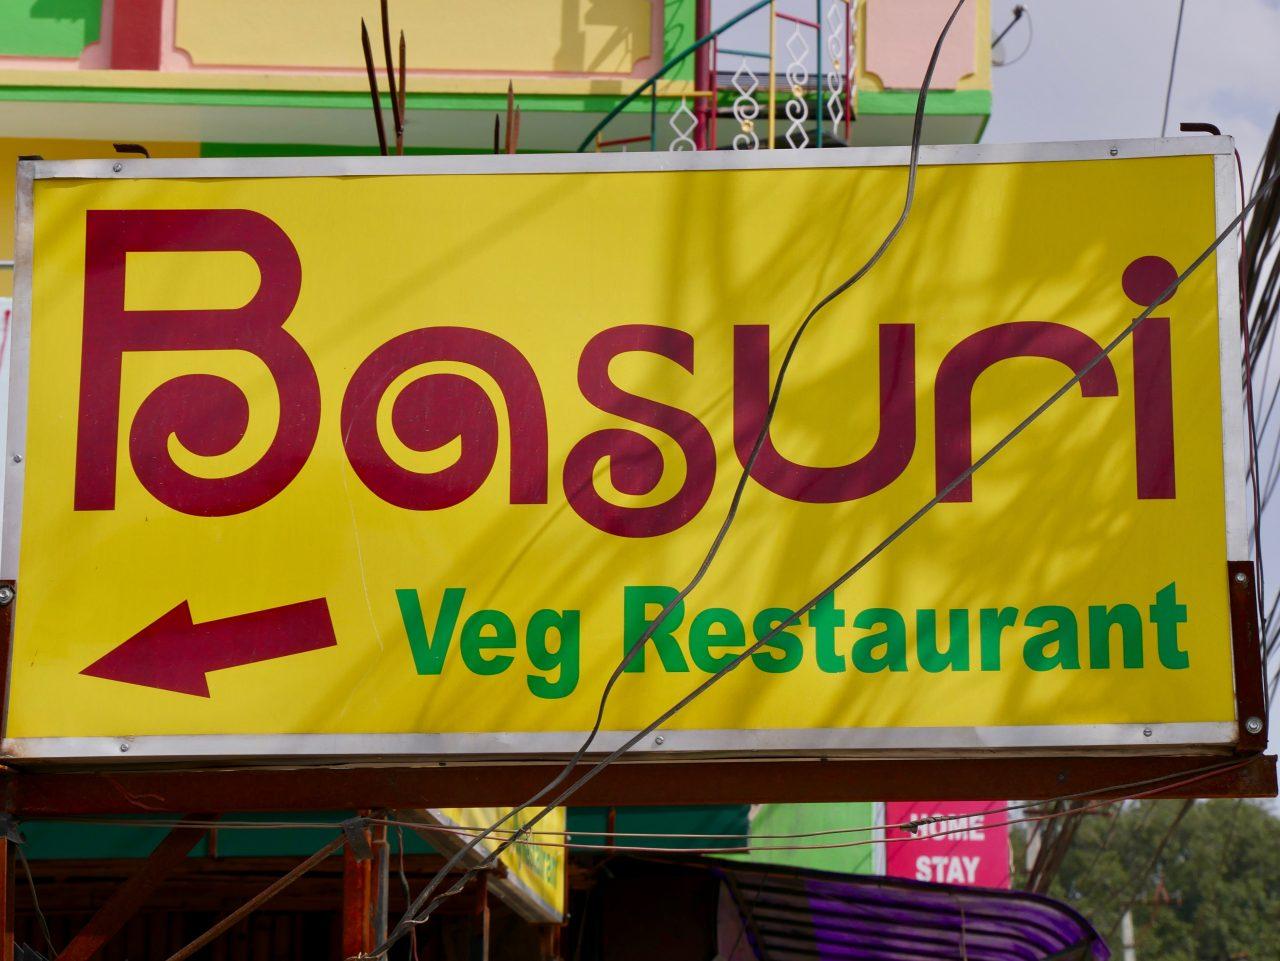 Basuri Veg Restaurant, Kathmandu, Nepal